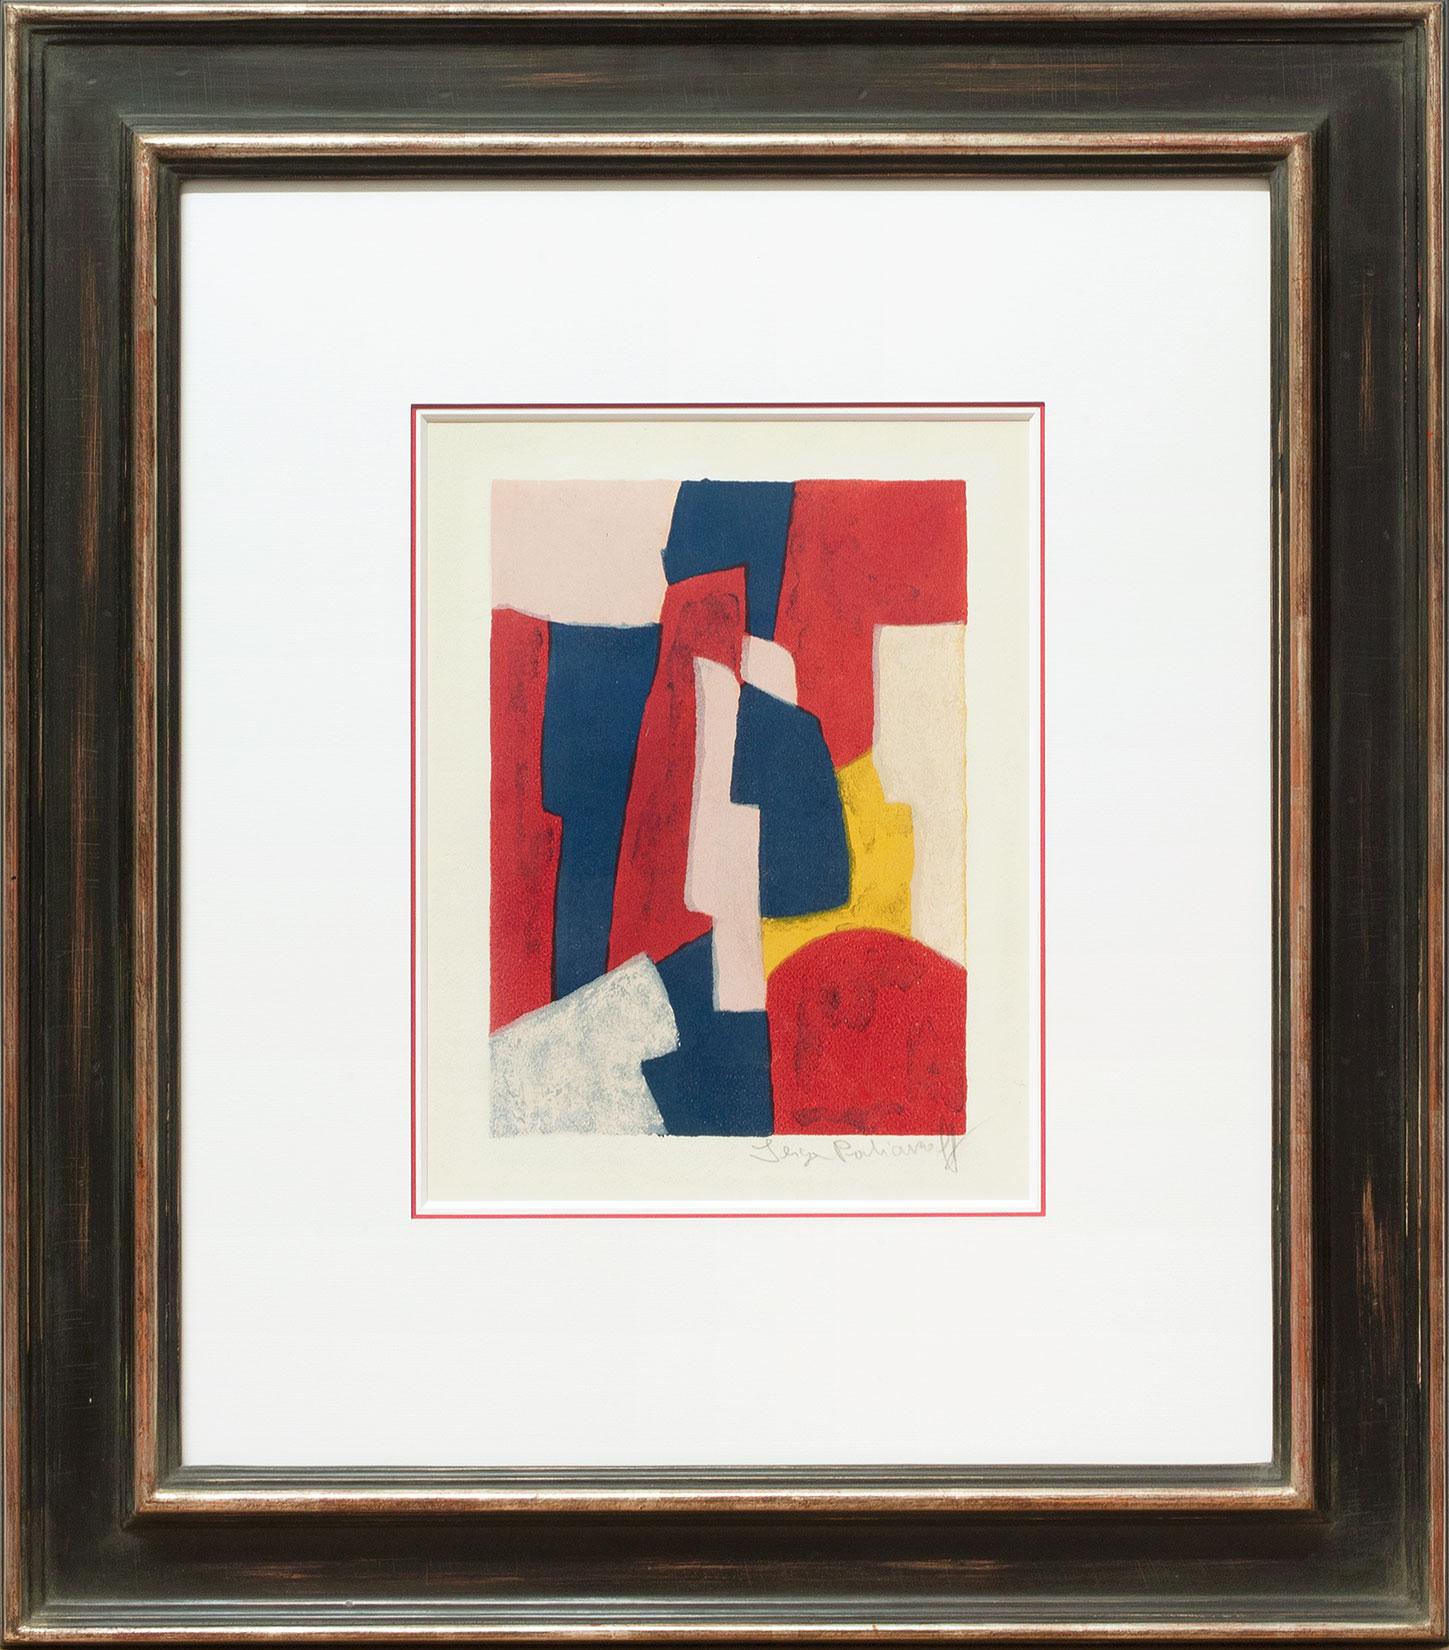 Serge Poliakoff « Composition bleue, rouge et rose » Galerie Française